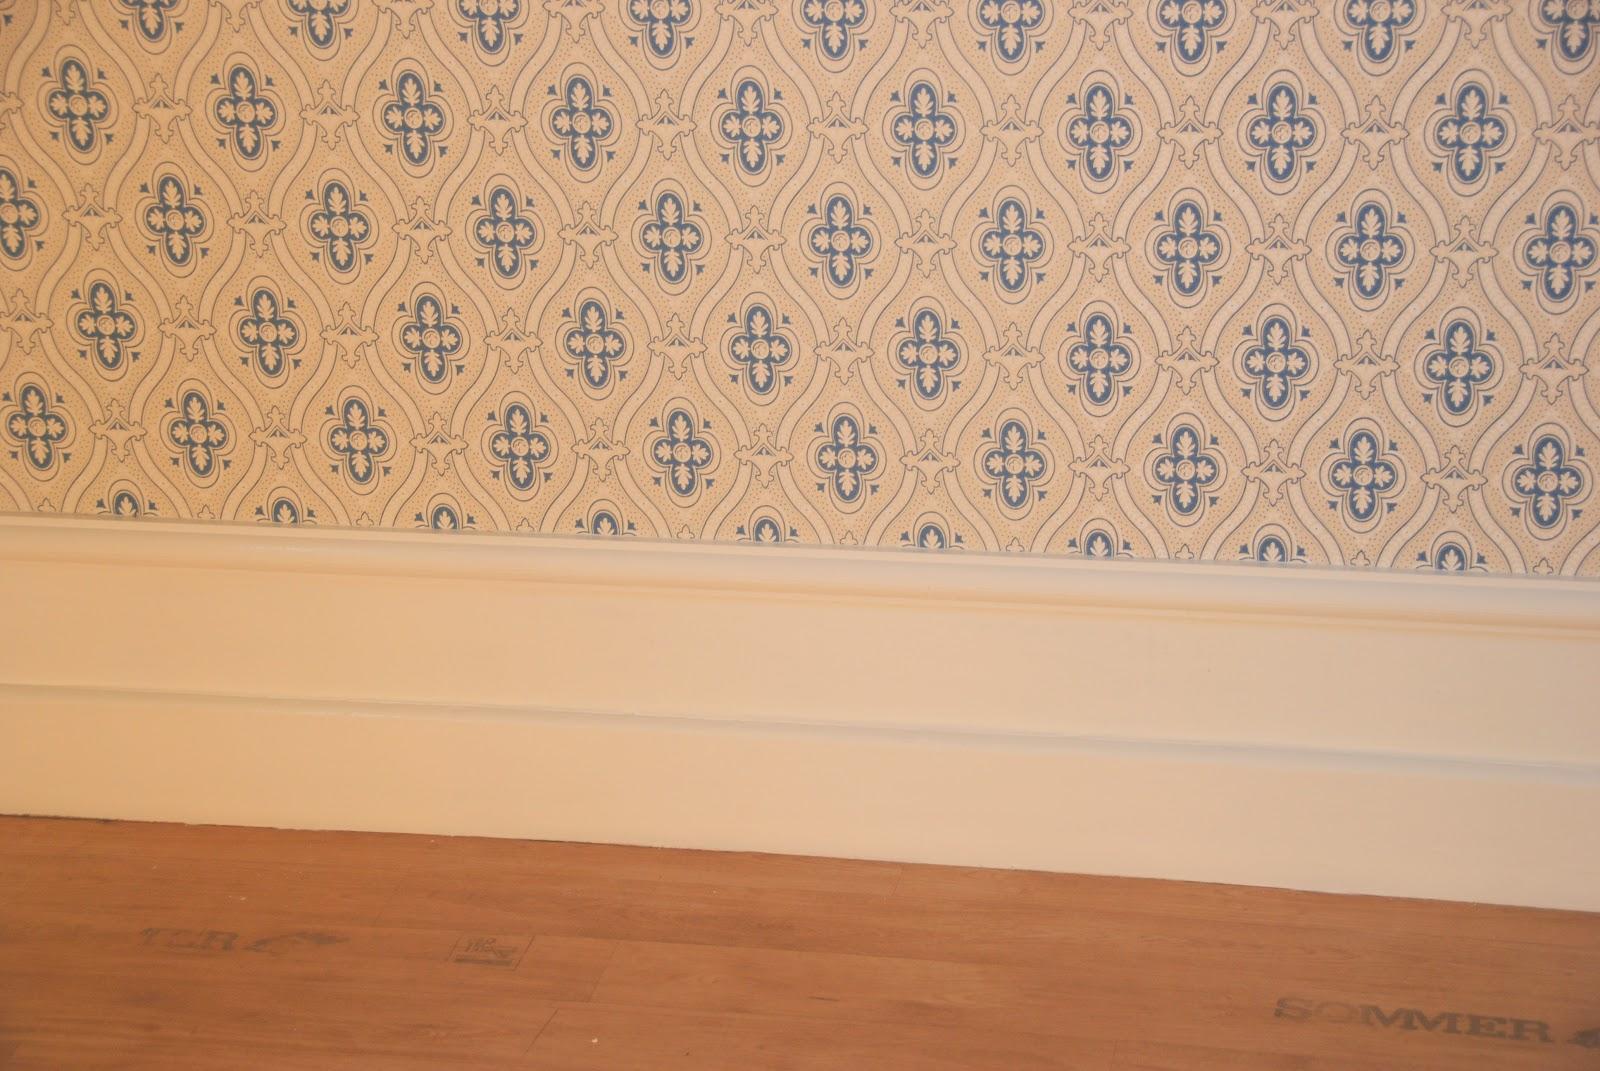 Nytt Kok I Gammaldags Stil :  or livet!  renovering, konst och design Nytt sovrum i gammal stil